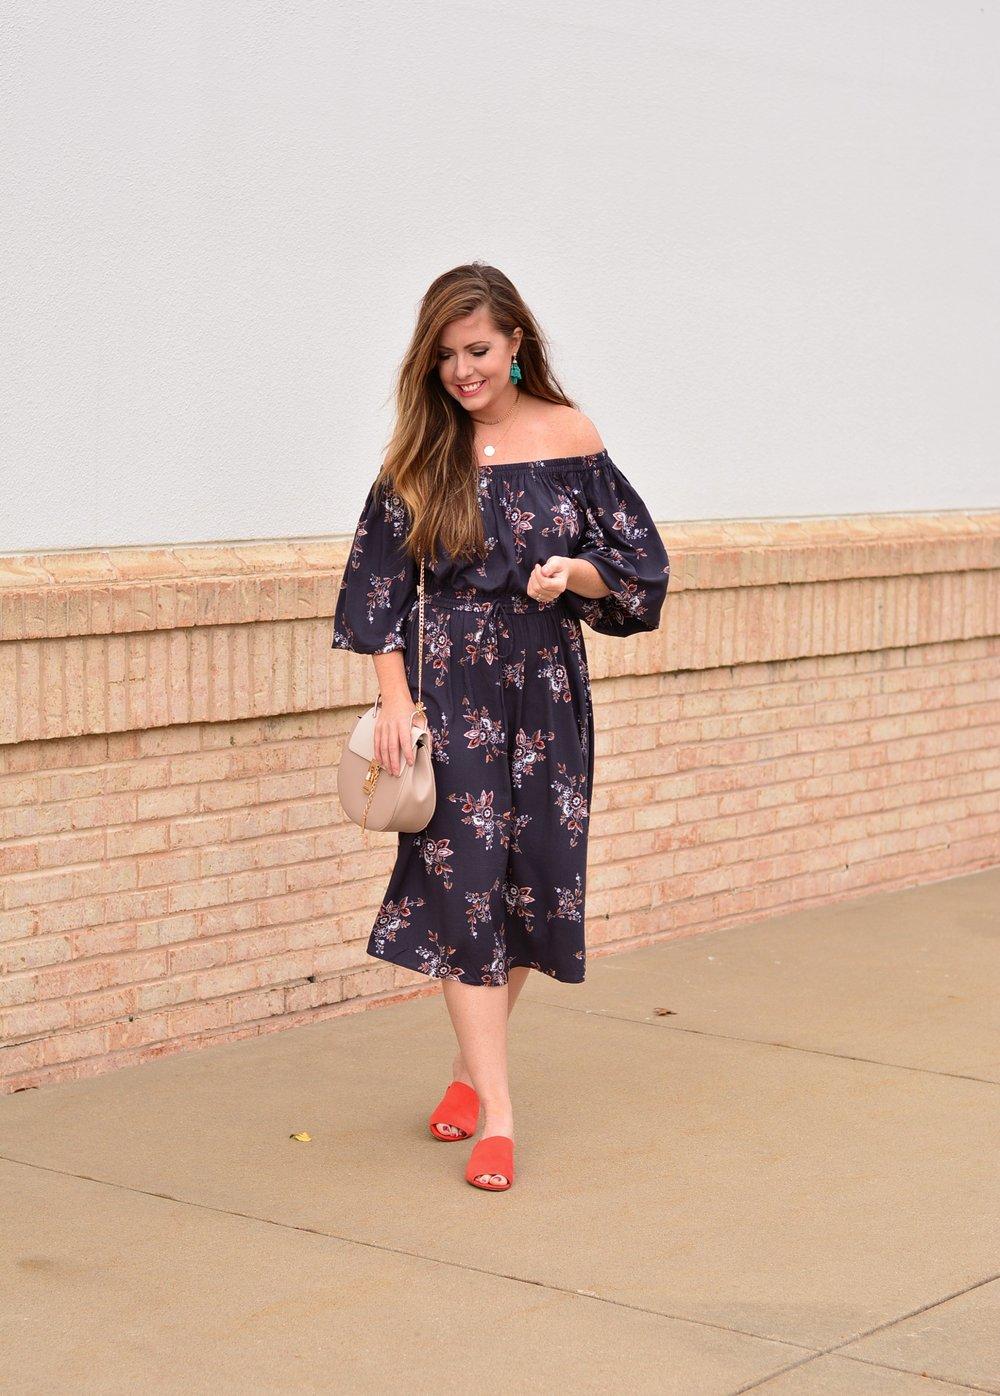 Off the shoulder floral dress for fall